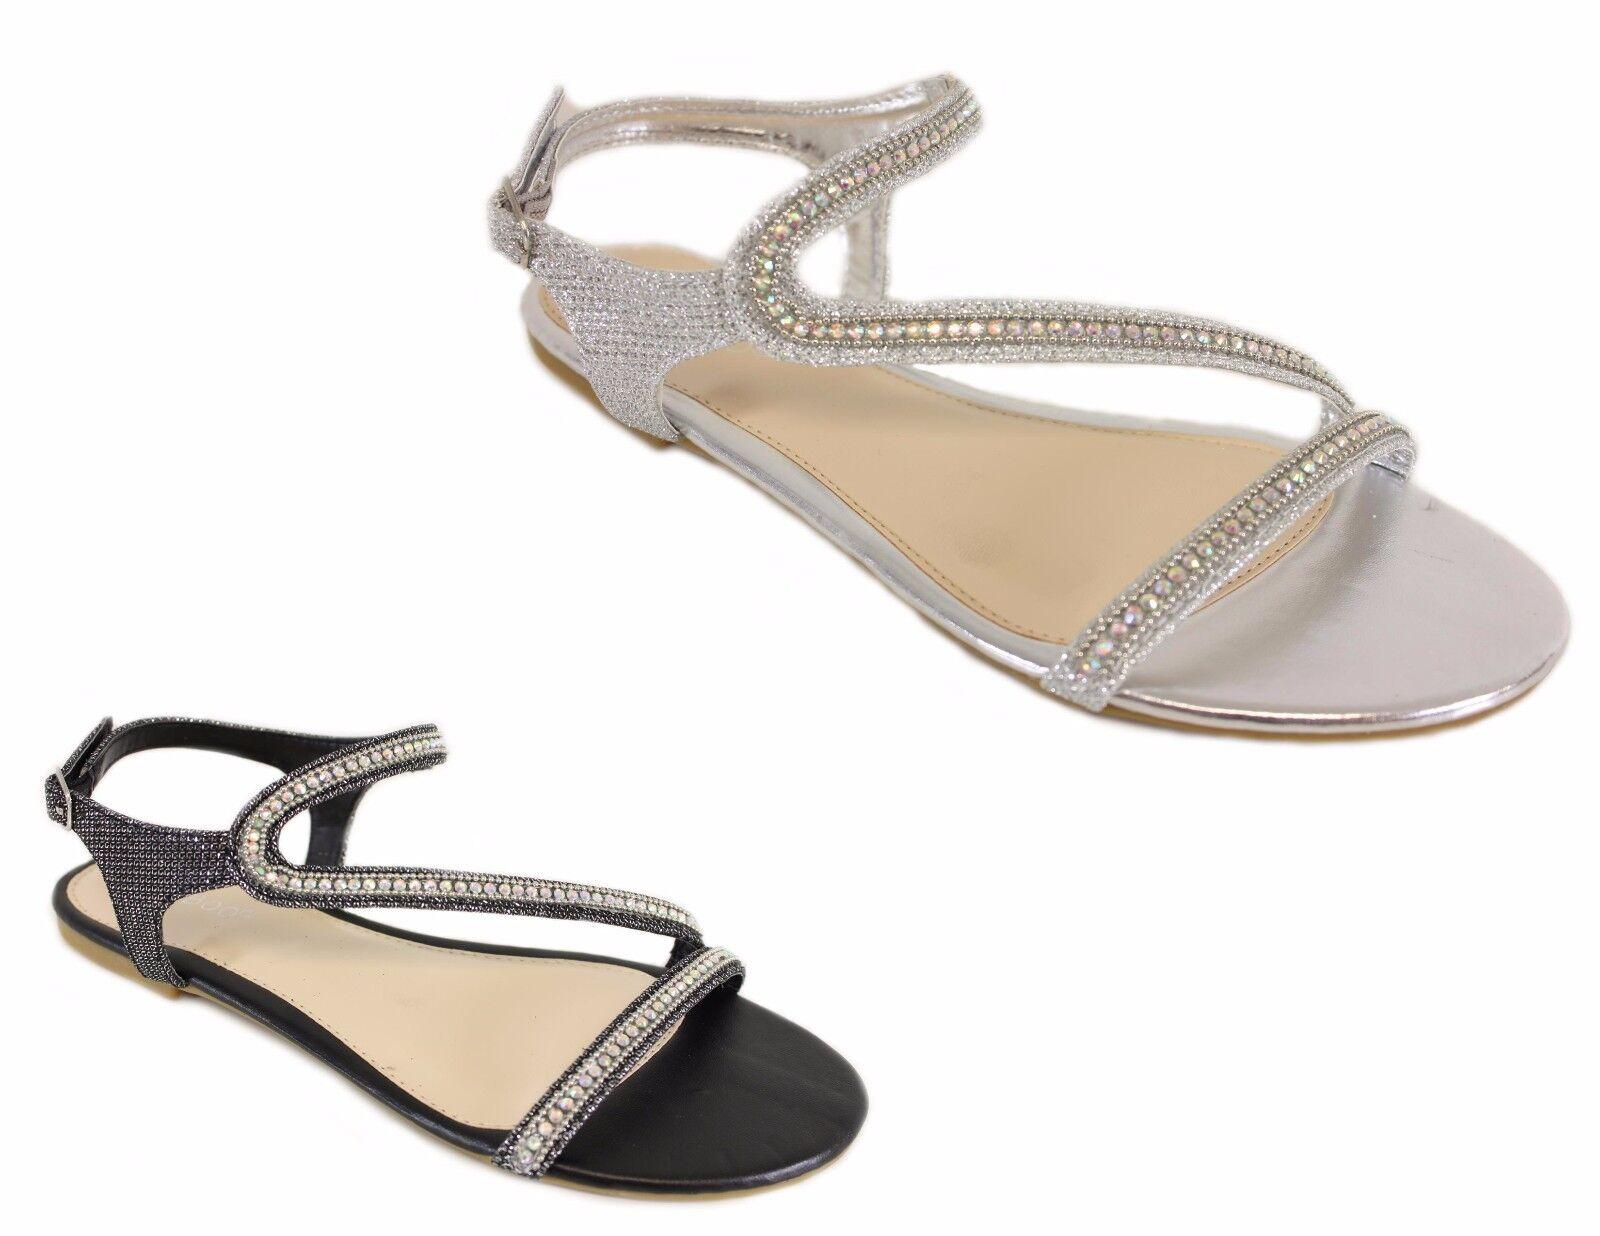 New CALEB19 Women Sandals Shoes Gladiator Flip Thong Flops T Strap Flip Gladiator Flat Strappy 89469c